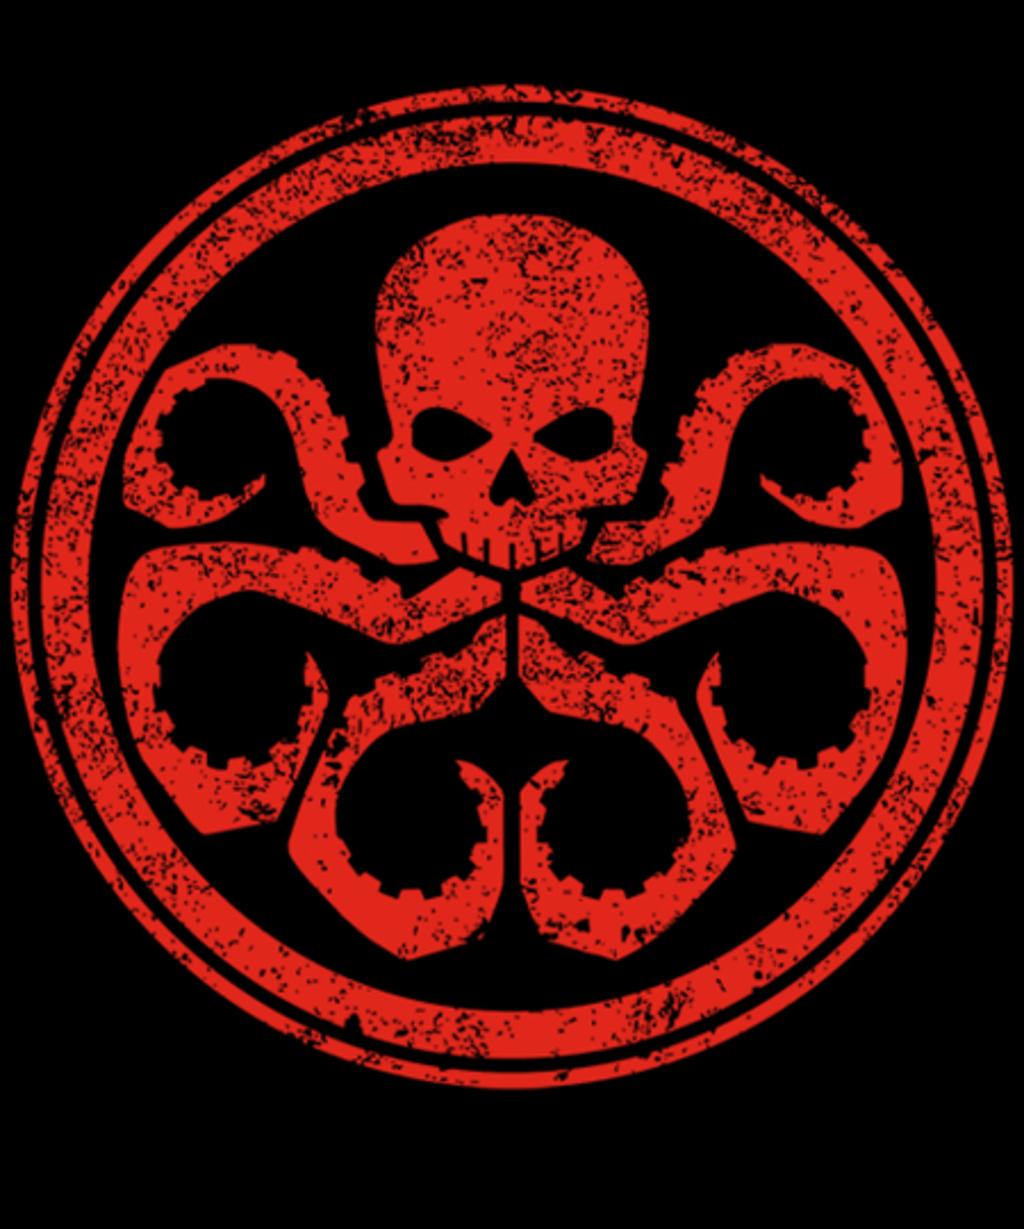 Qwertee: Hail Hydra!